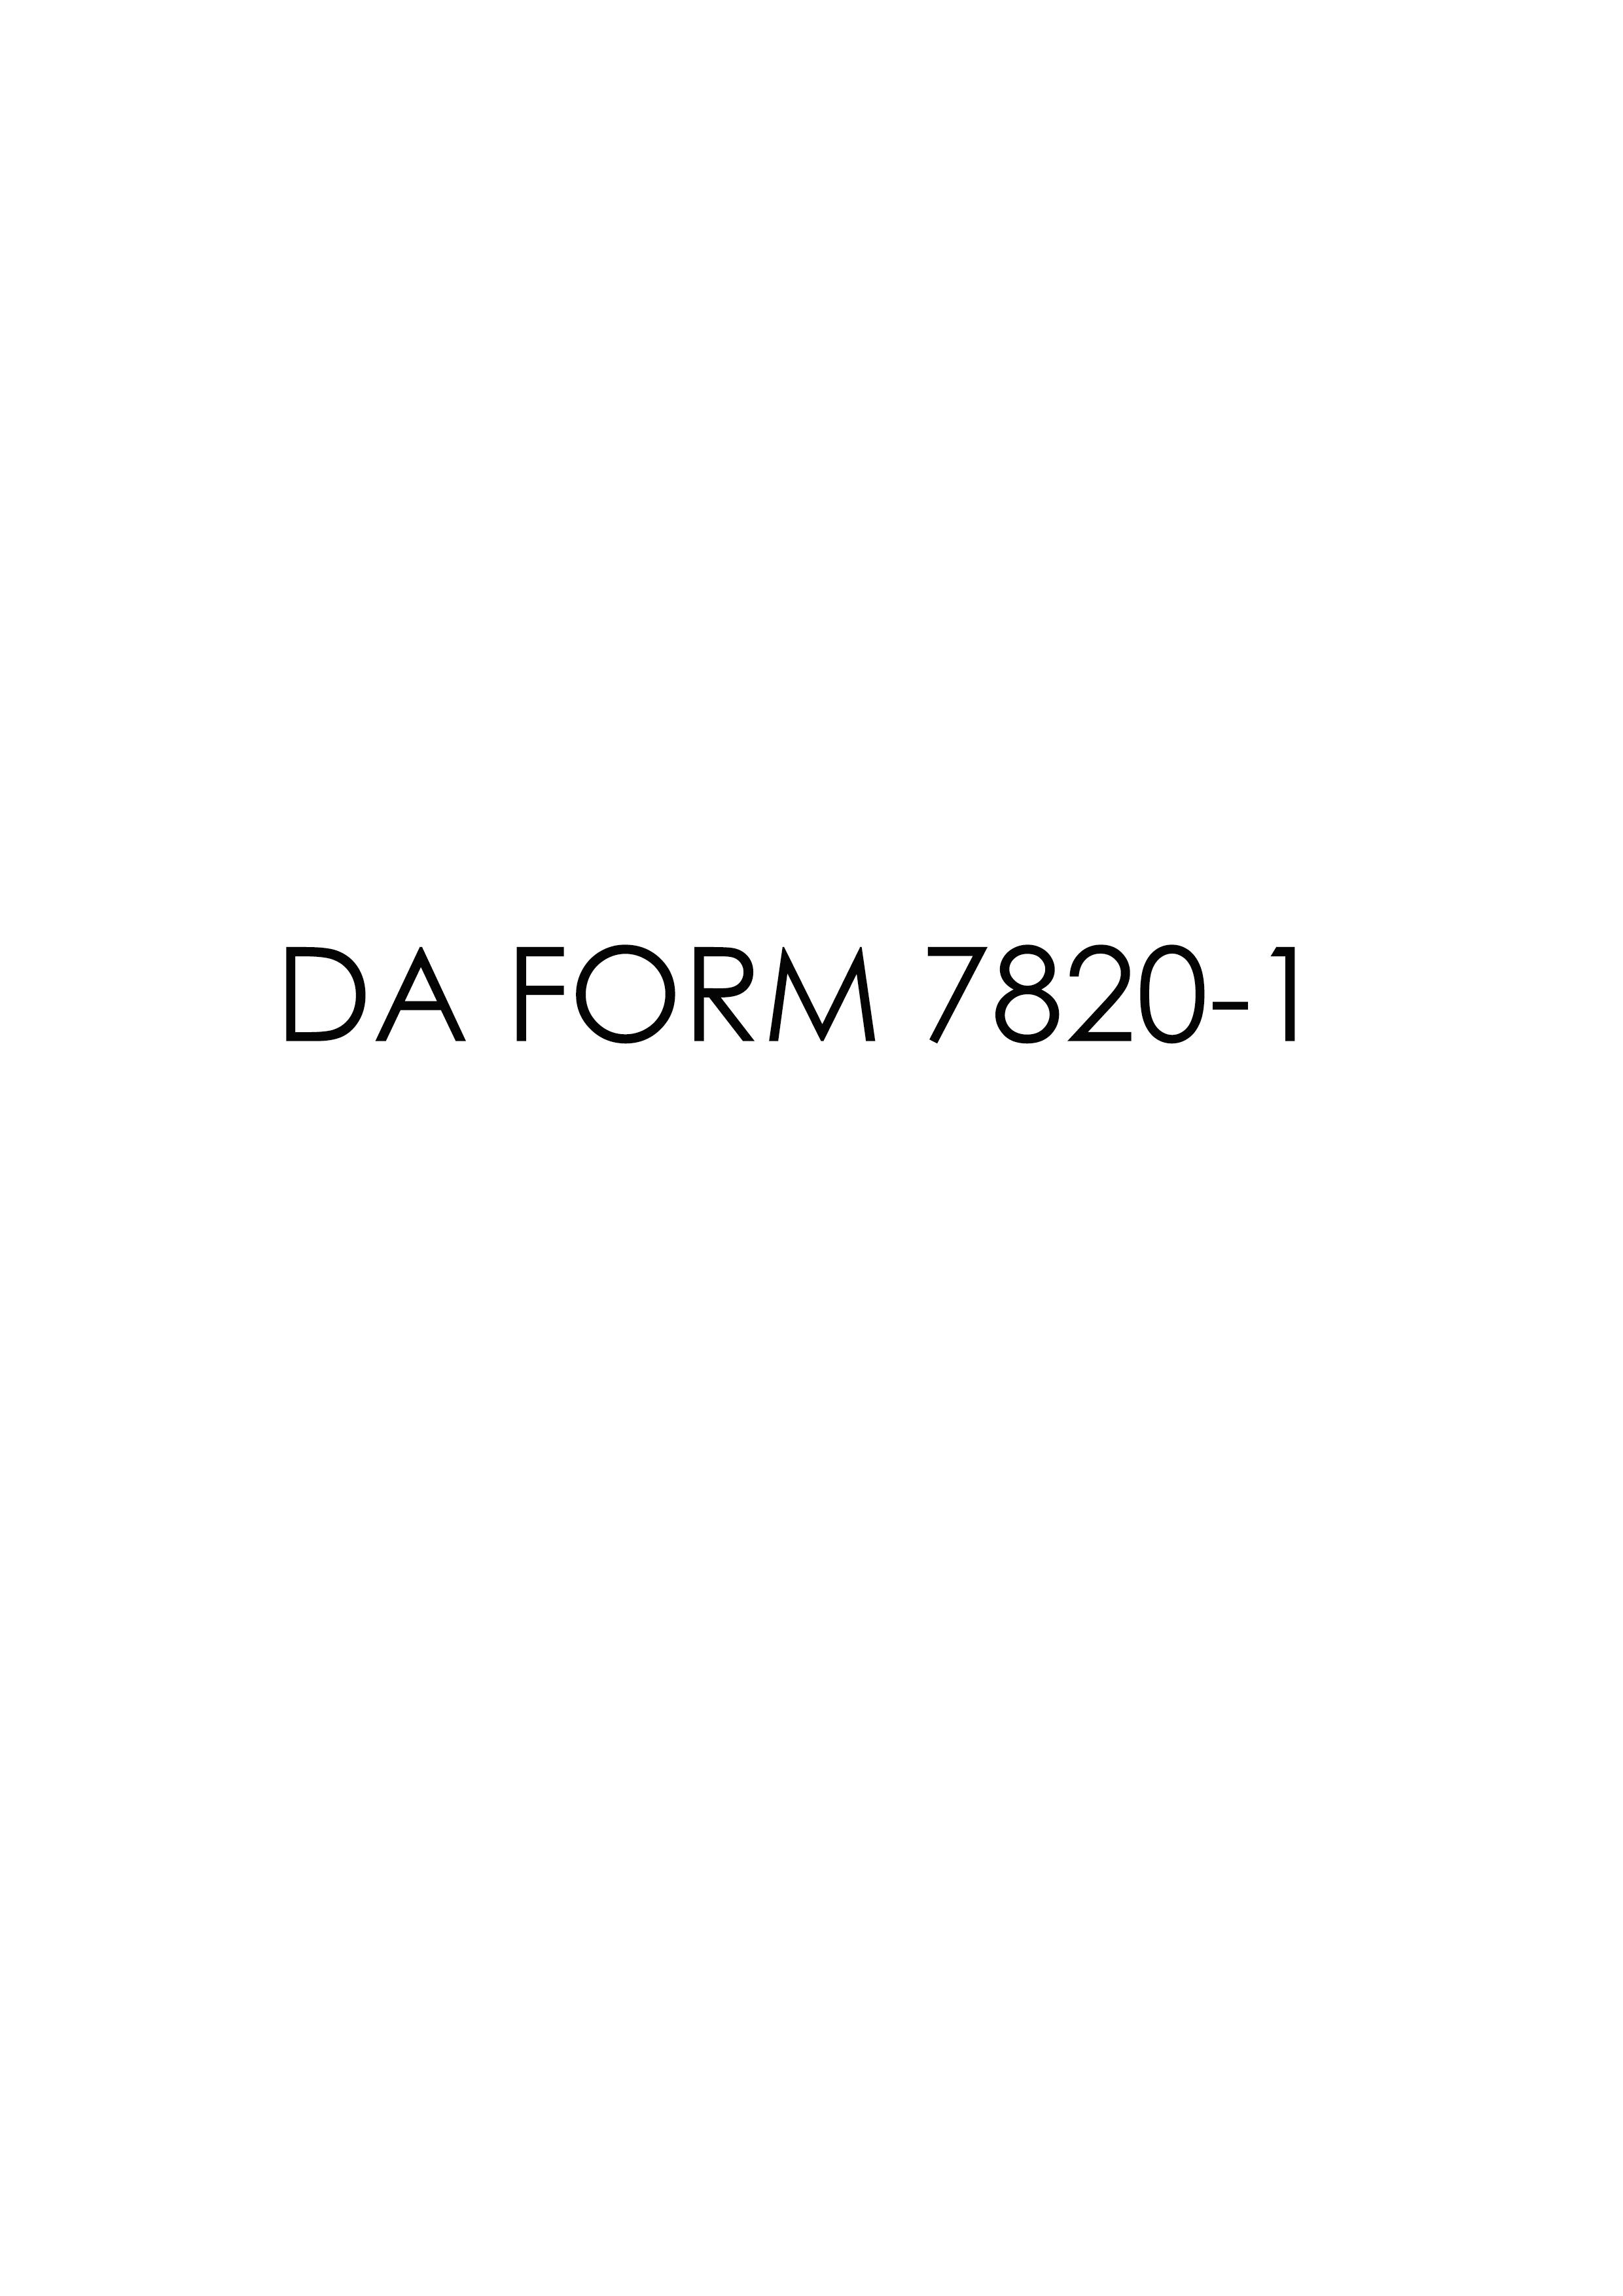 Download da Form 7820-1 Free